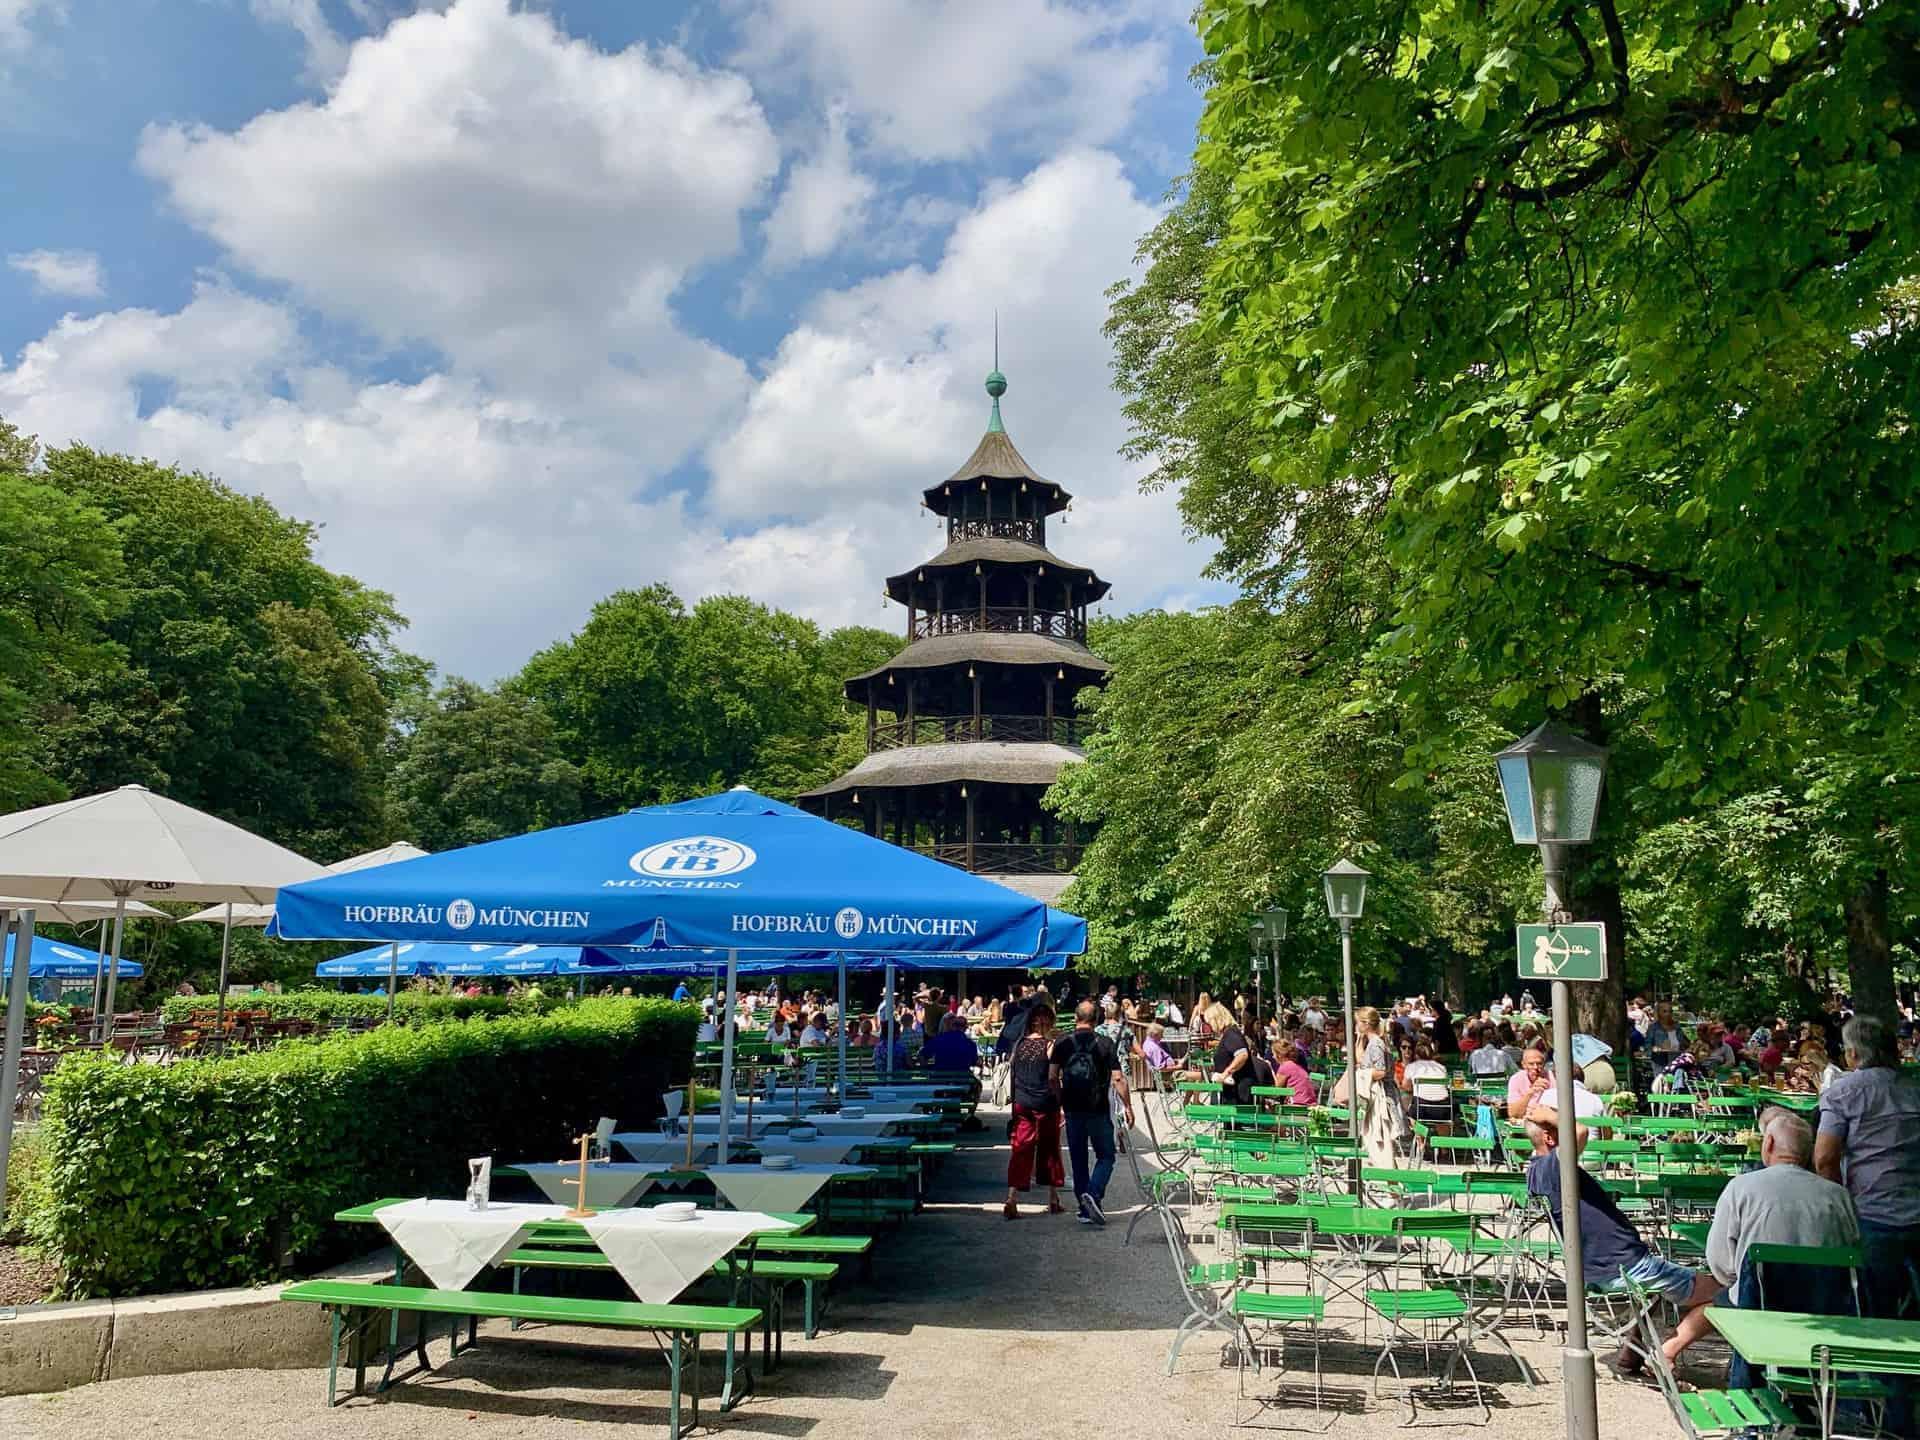 München_Biergarten_Chinesischer_Turm_Blick